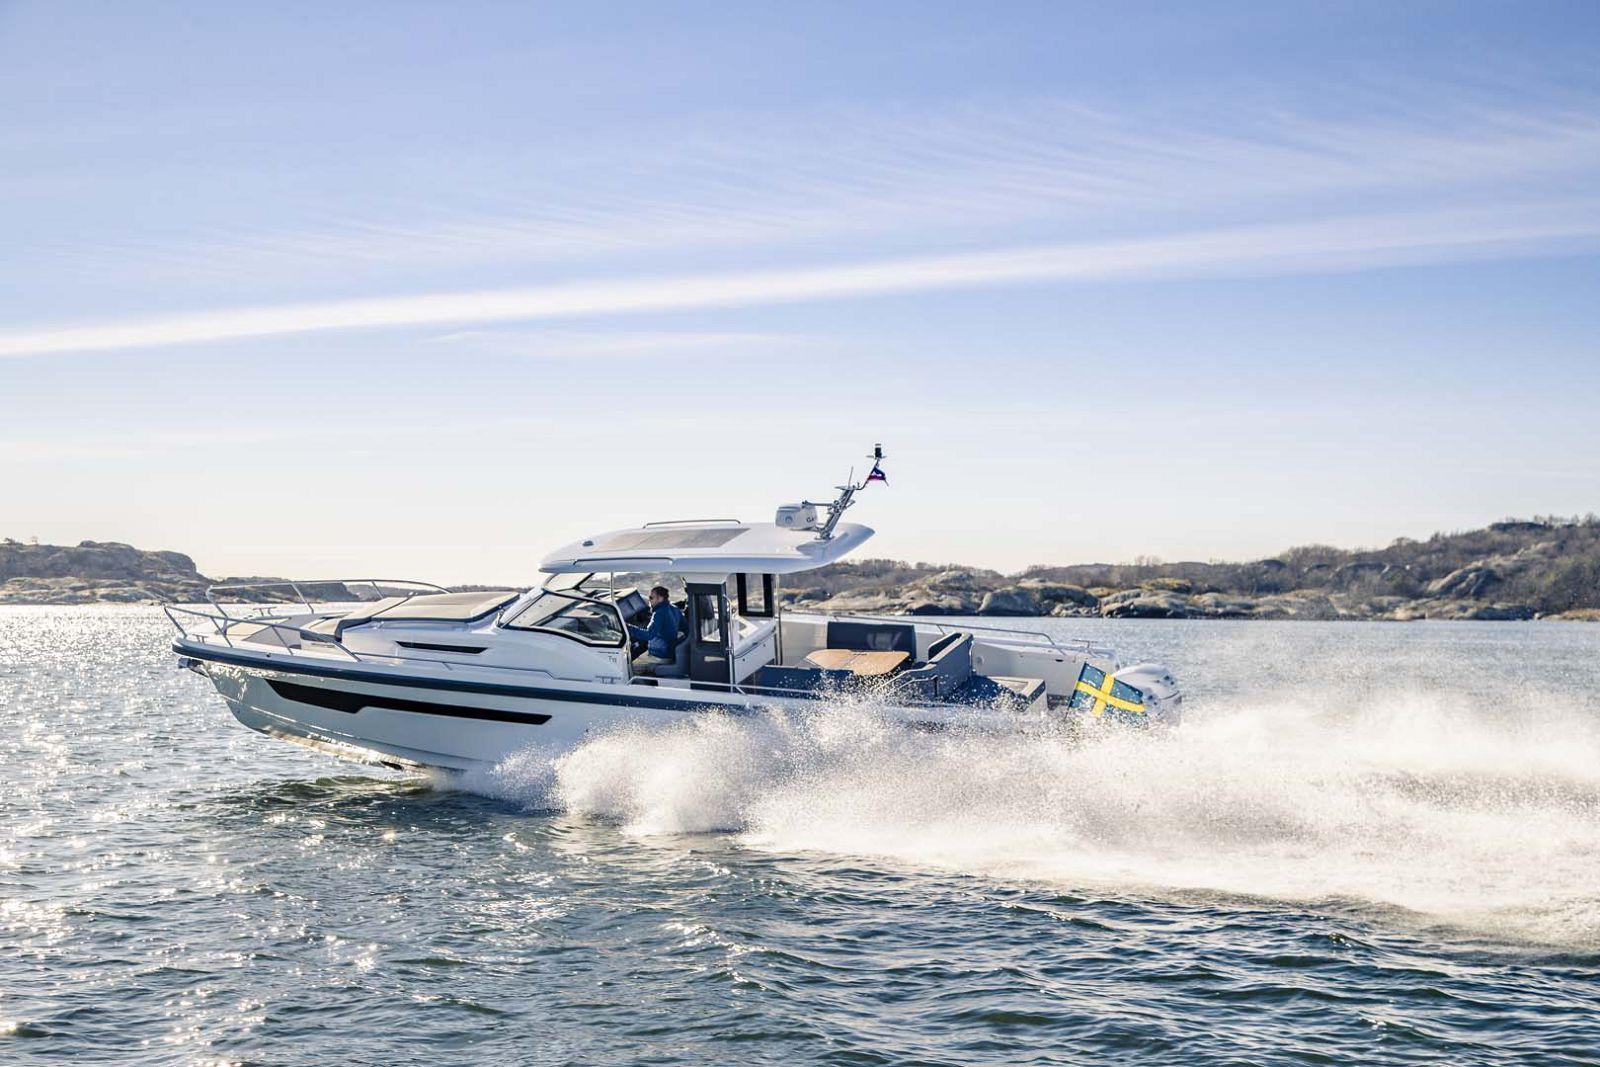 T11 Nimbus Boat Fast